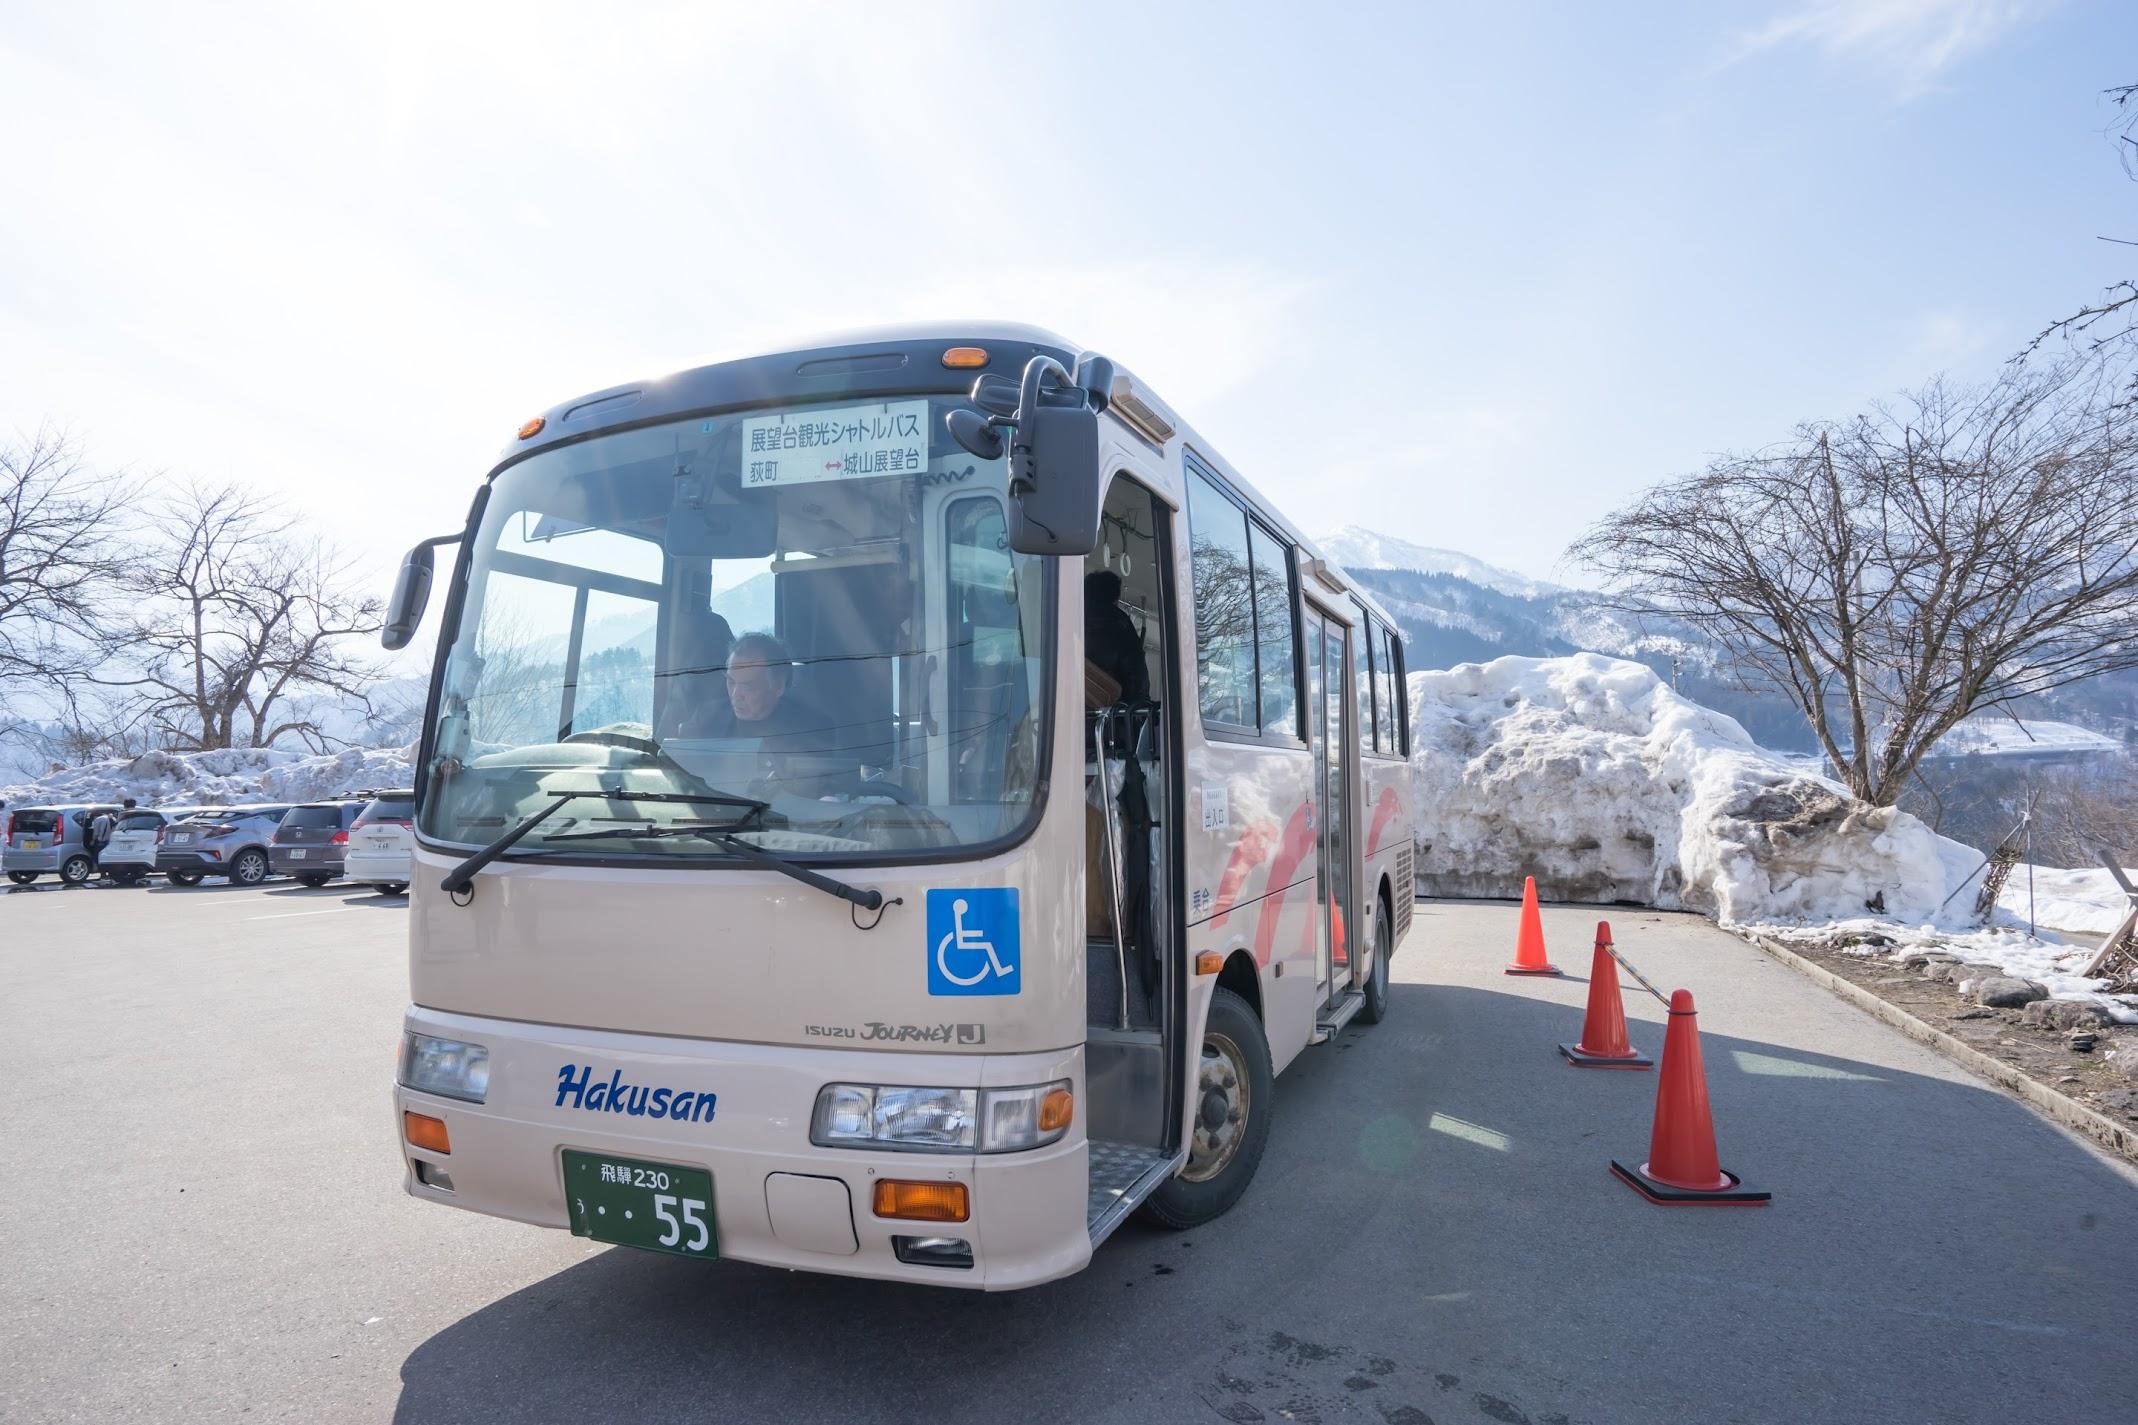 Shirakawa-go observatory suttle bus